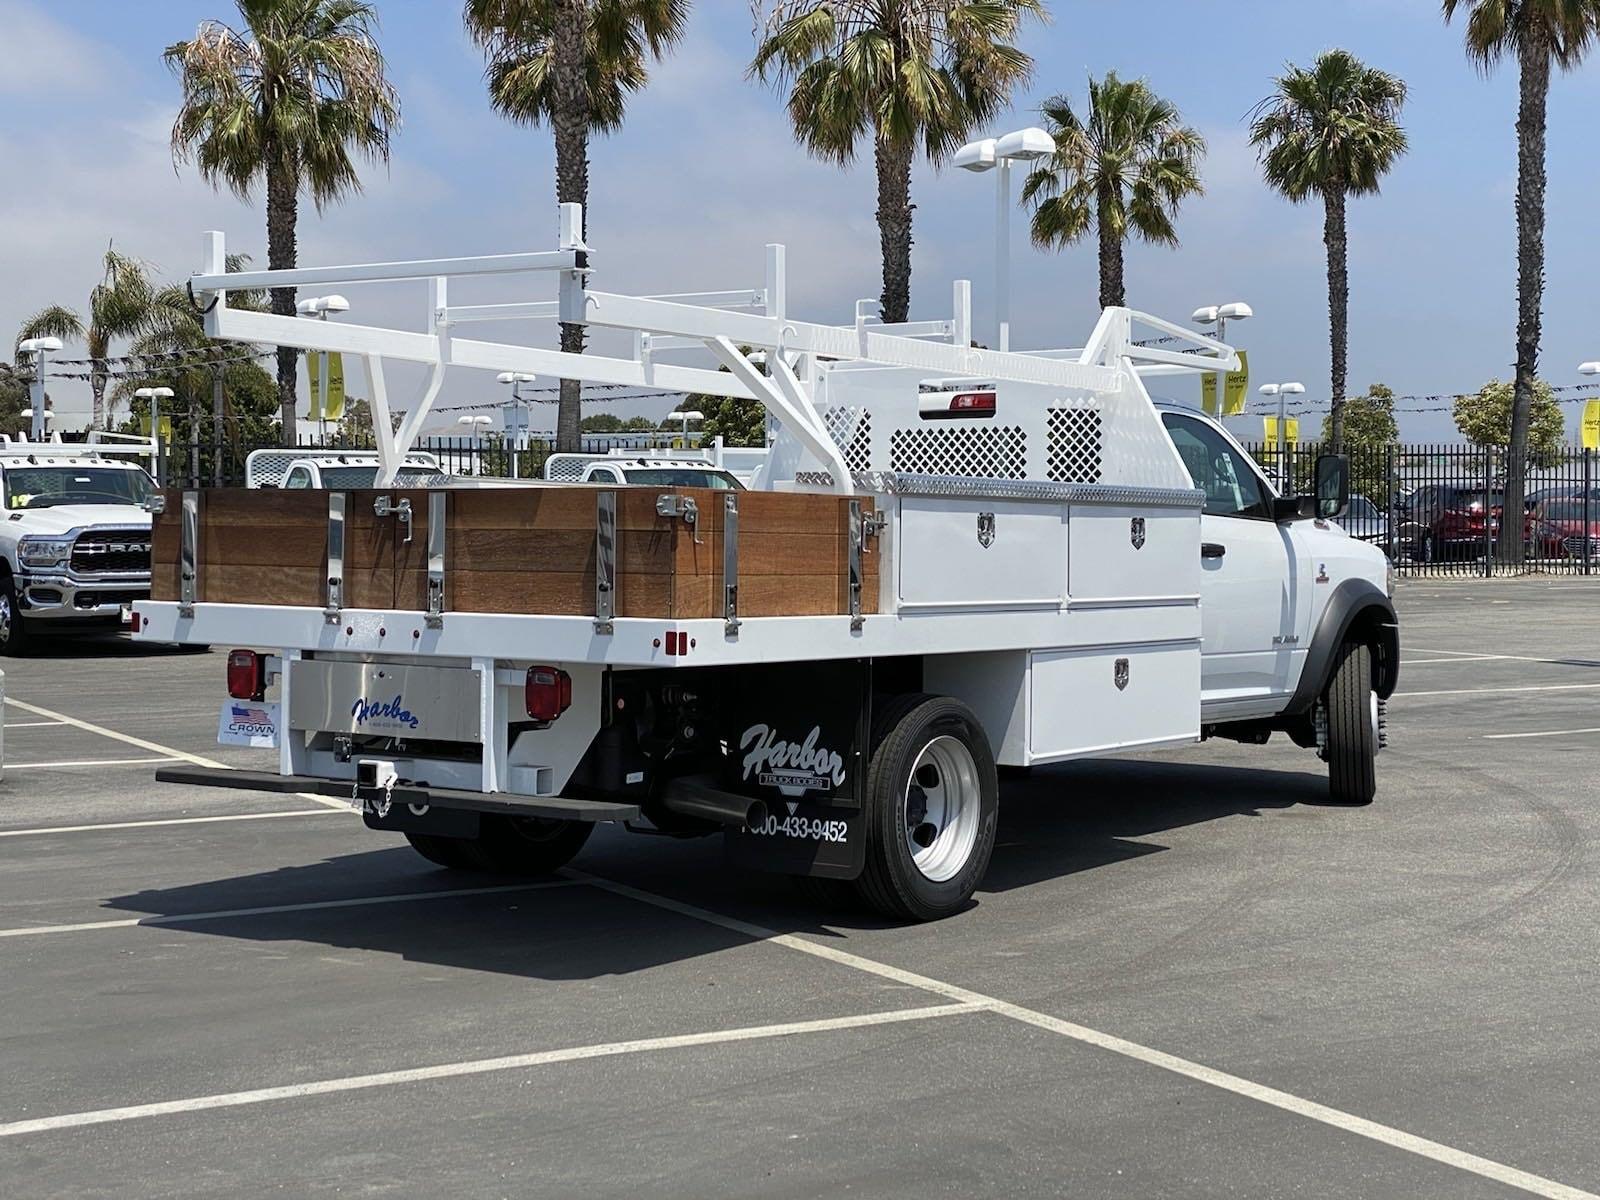 2020 Ram 4500 Regular Cab DRW 4x2, Harbor Contractor Body #H1881 - photo 1